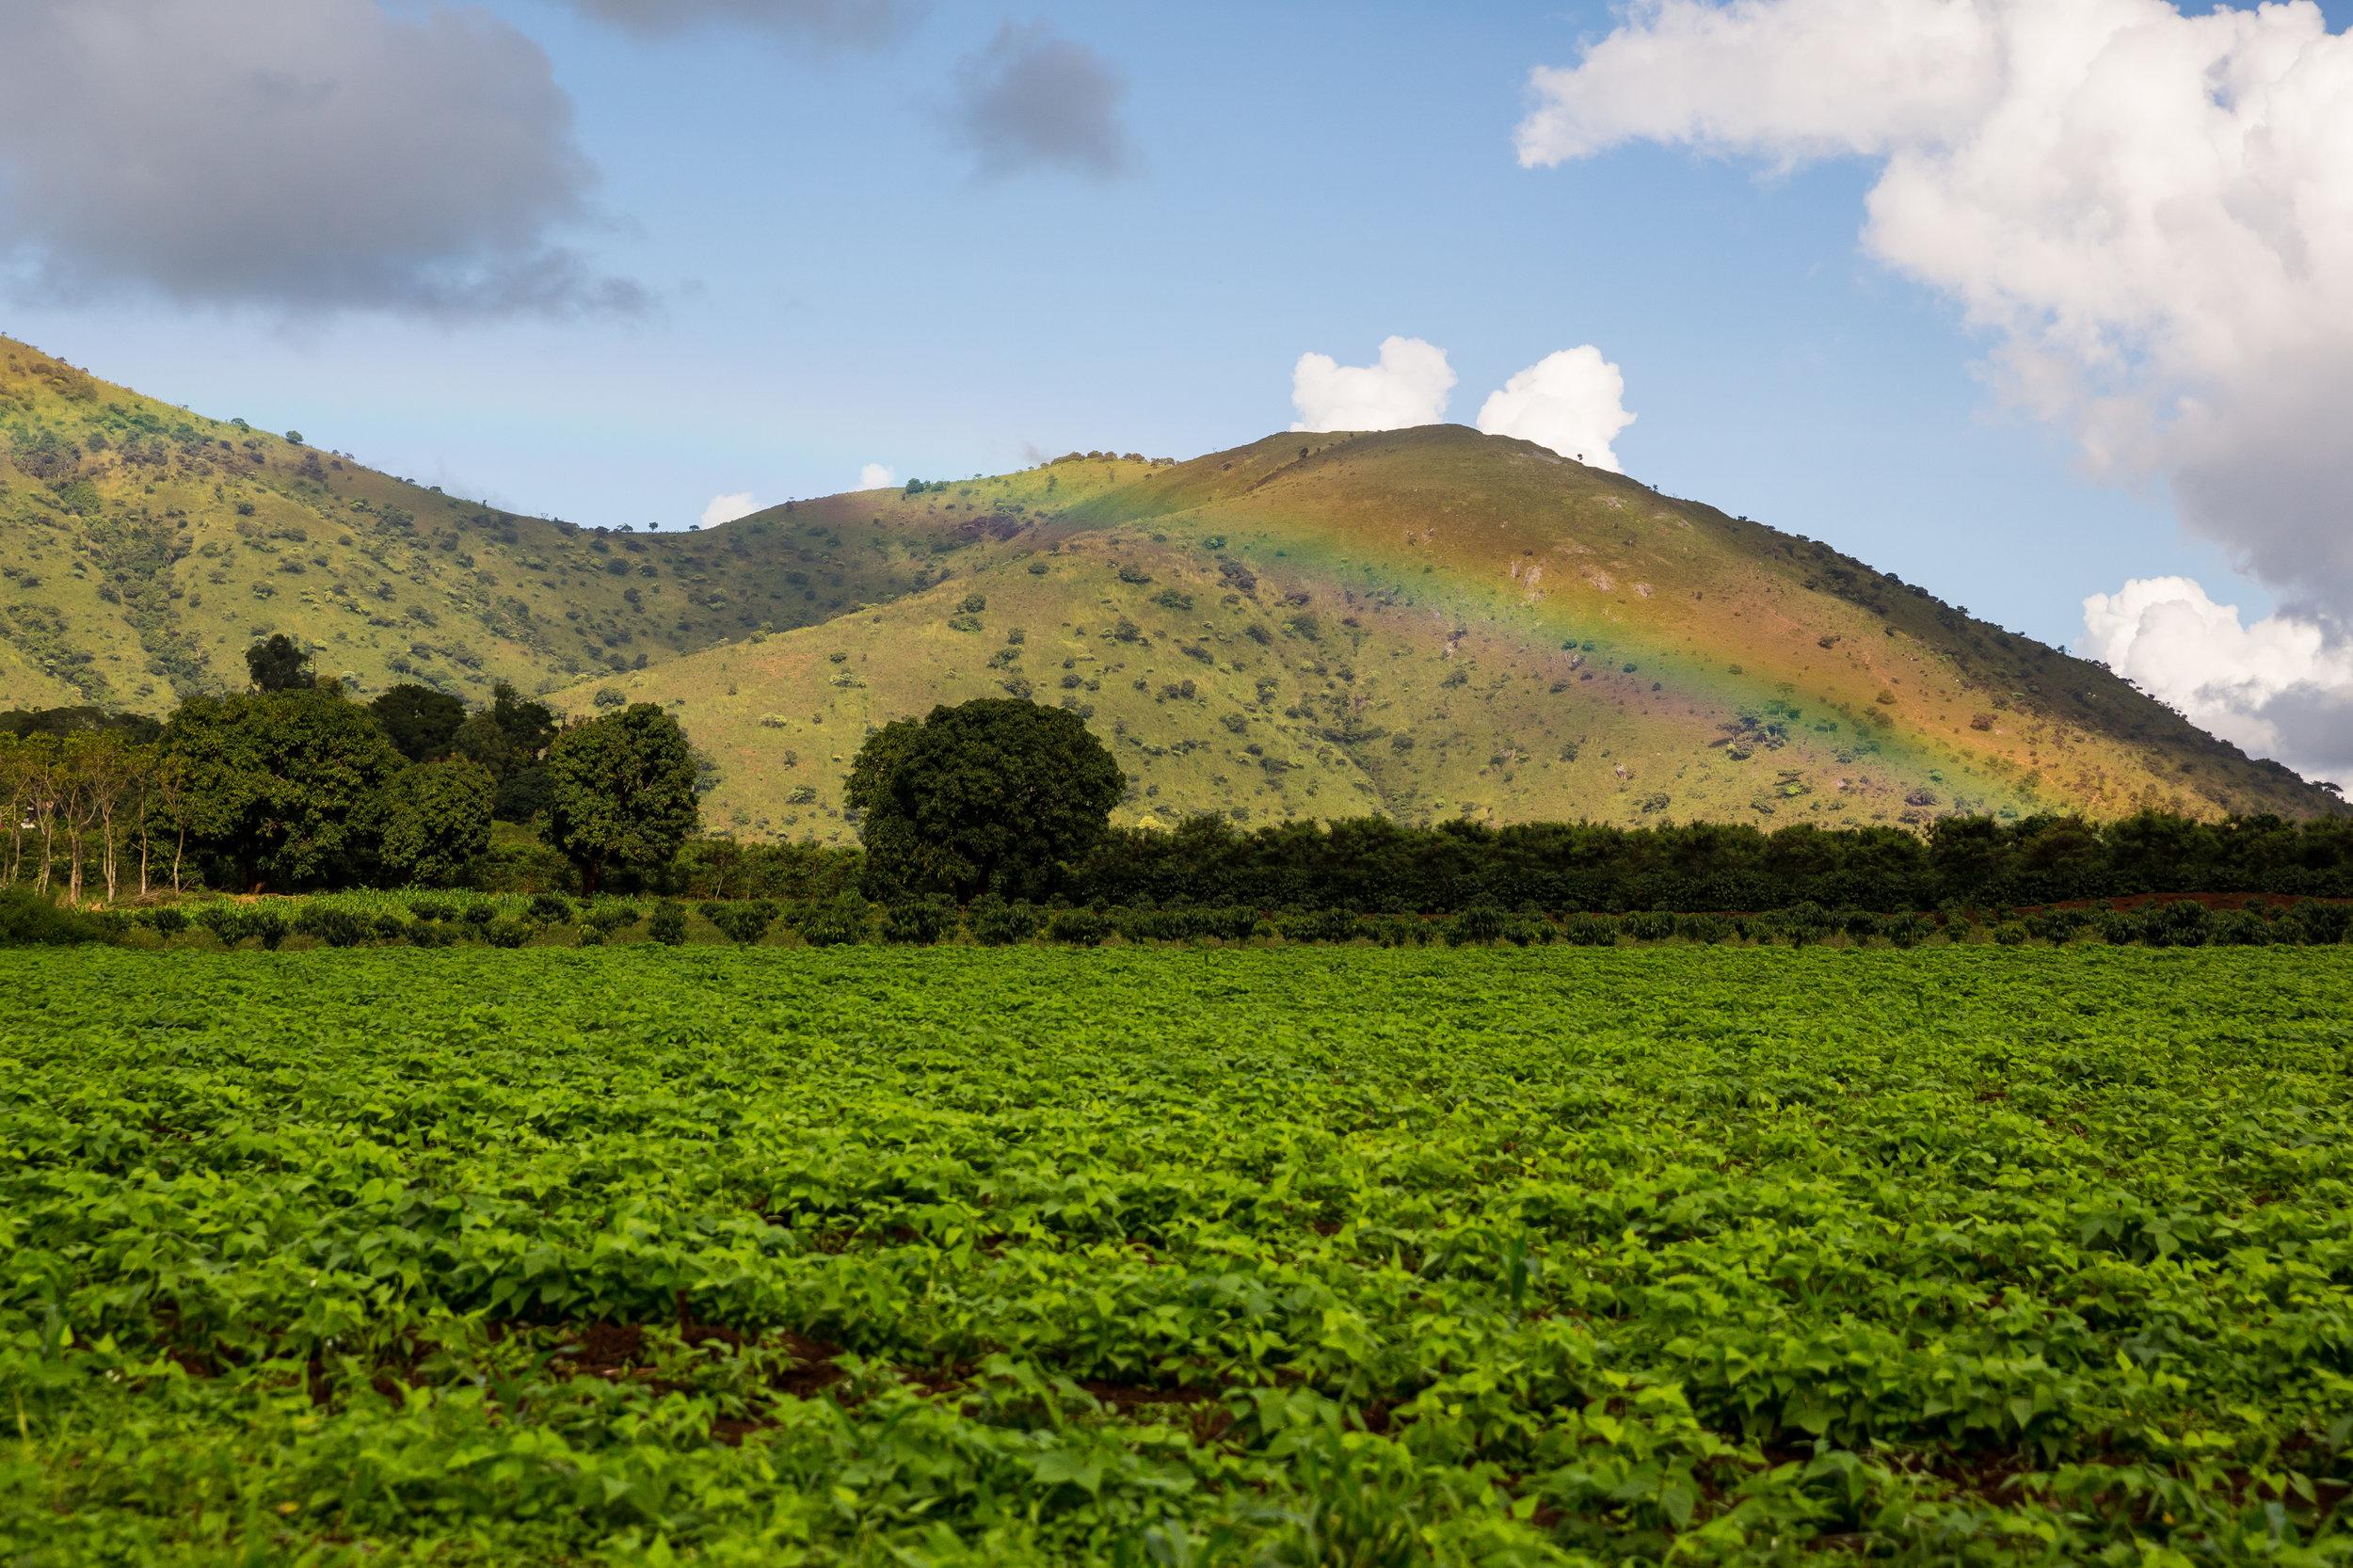 Coffee growing in Cameroon